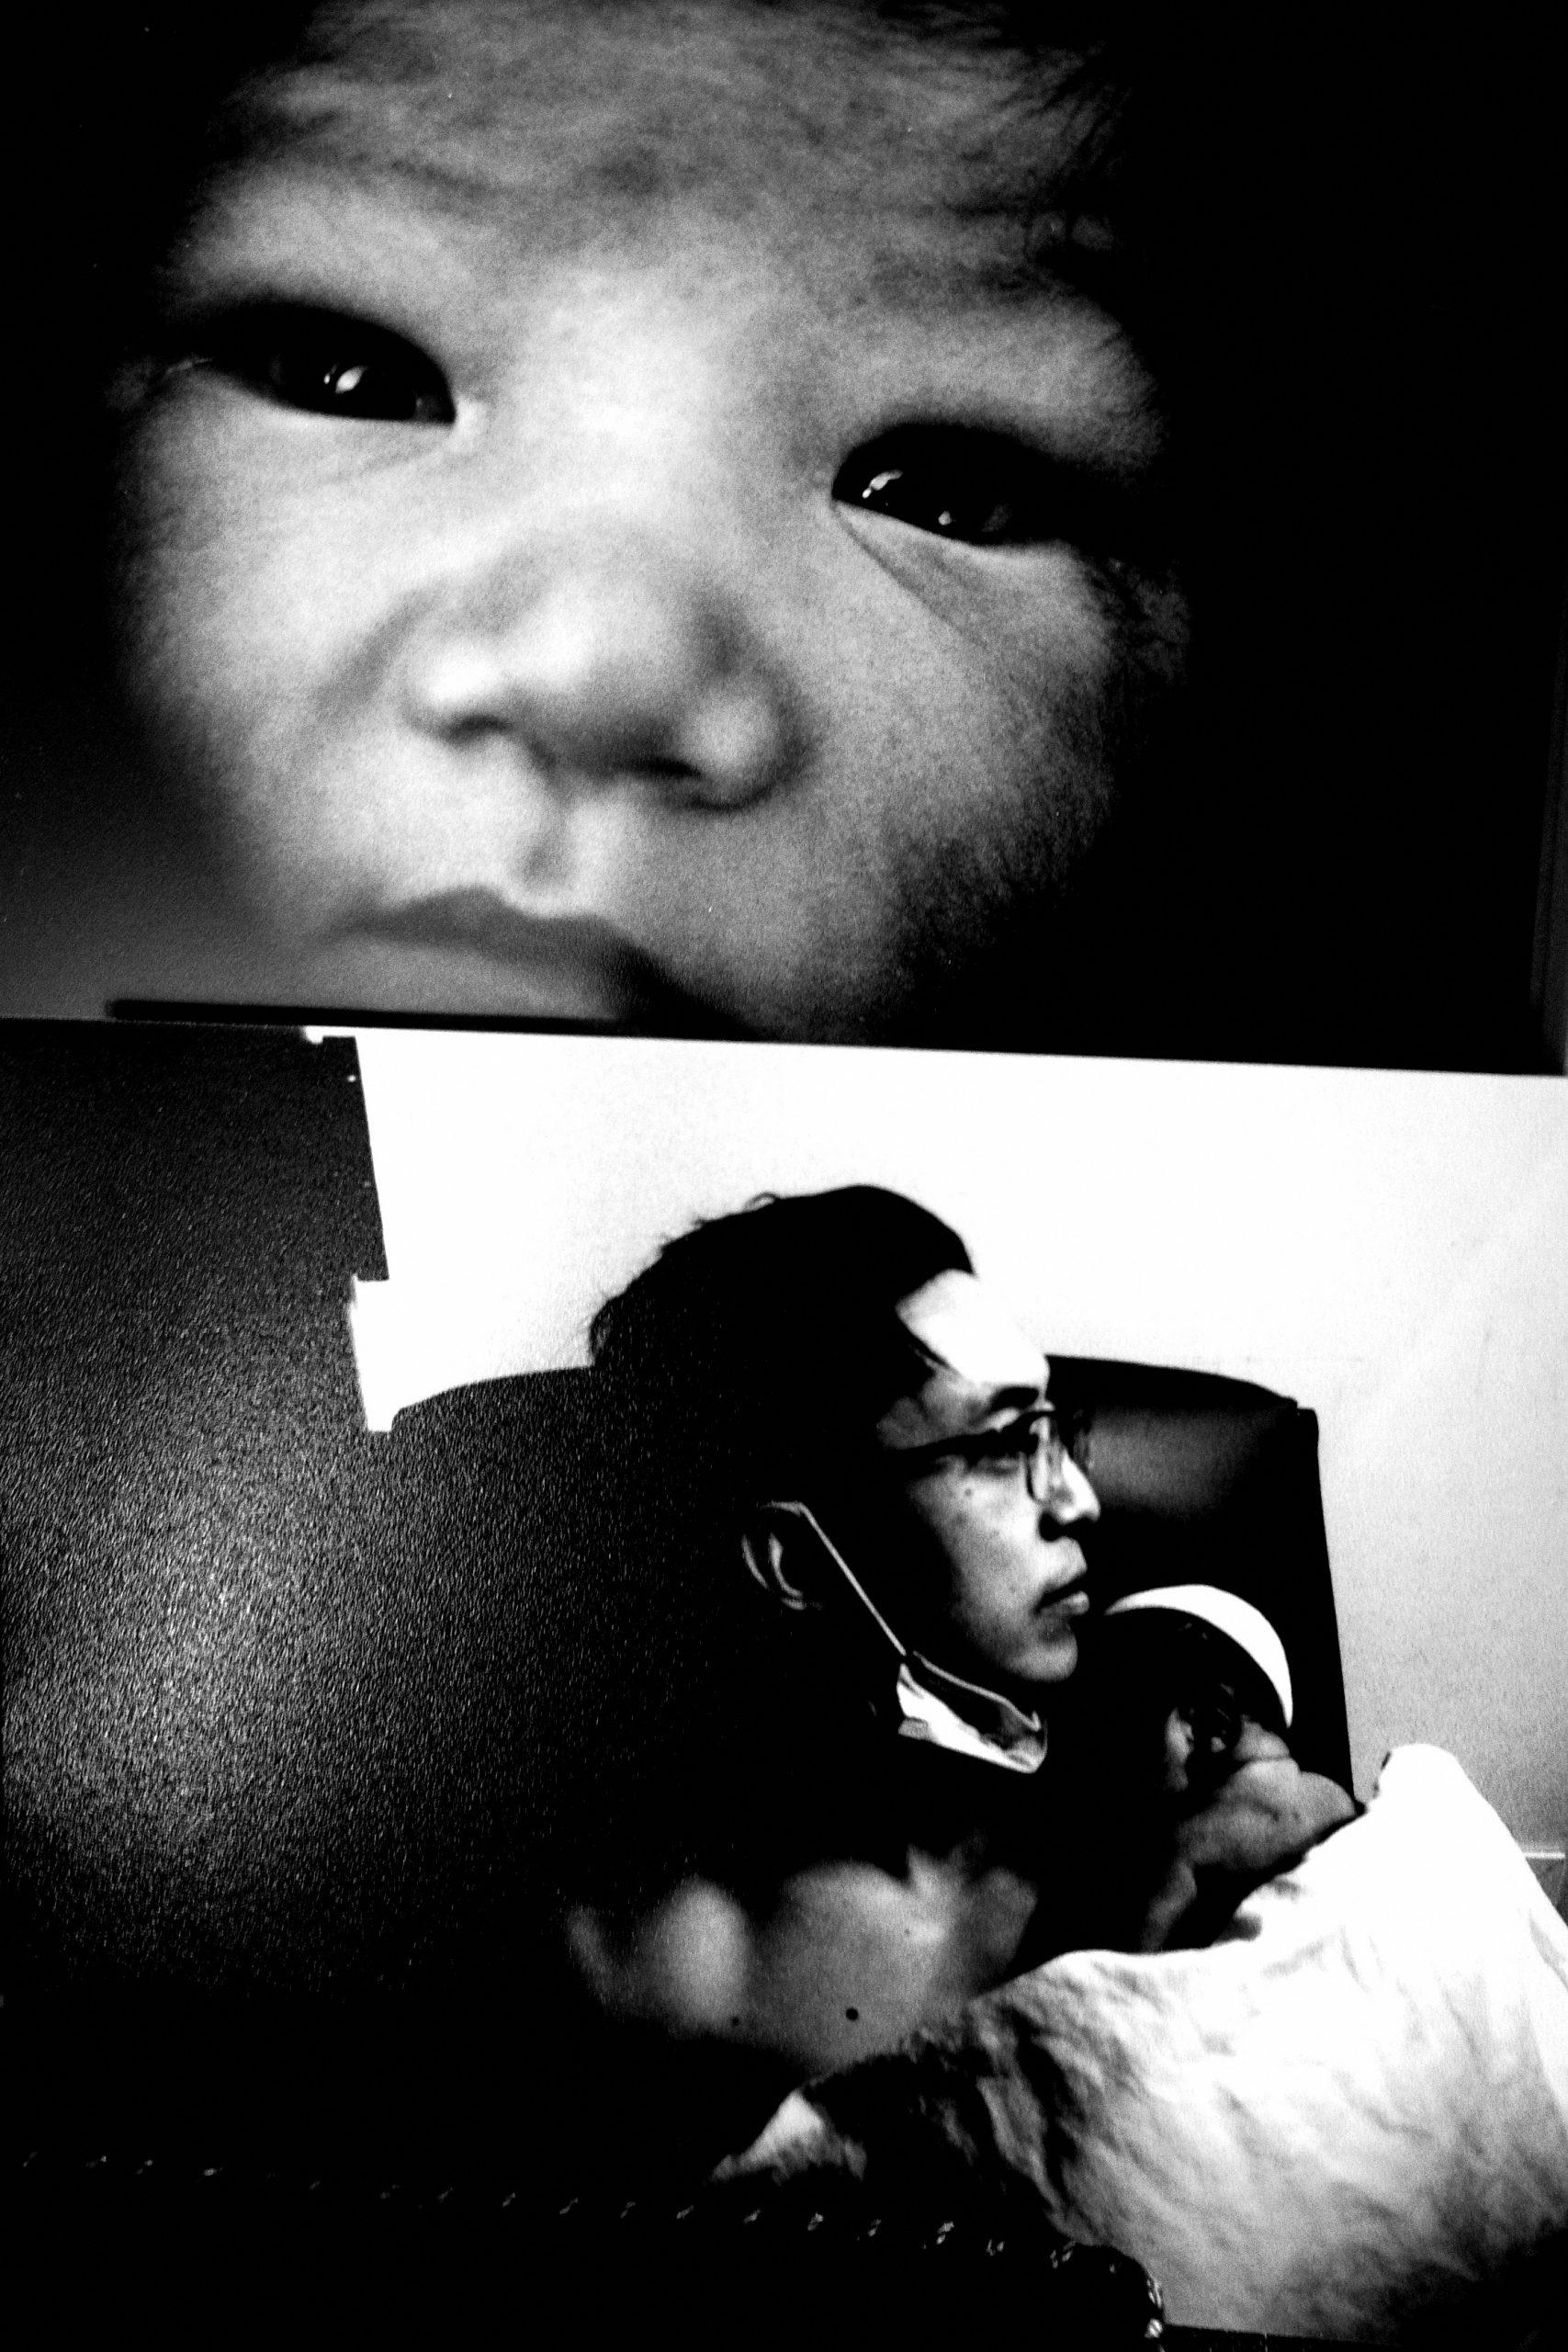 seneca and dad photo project